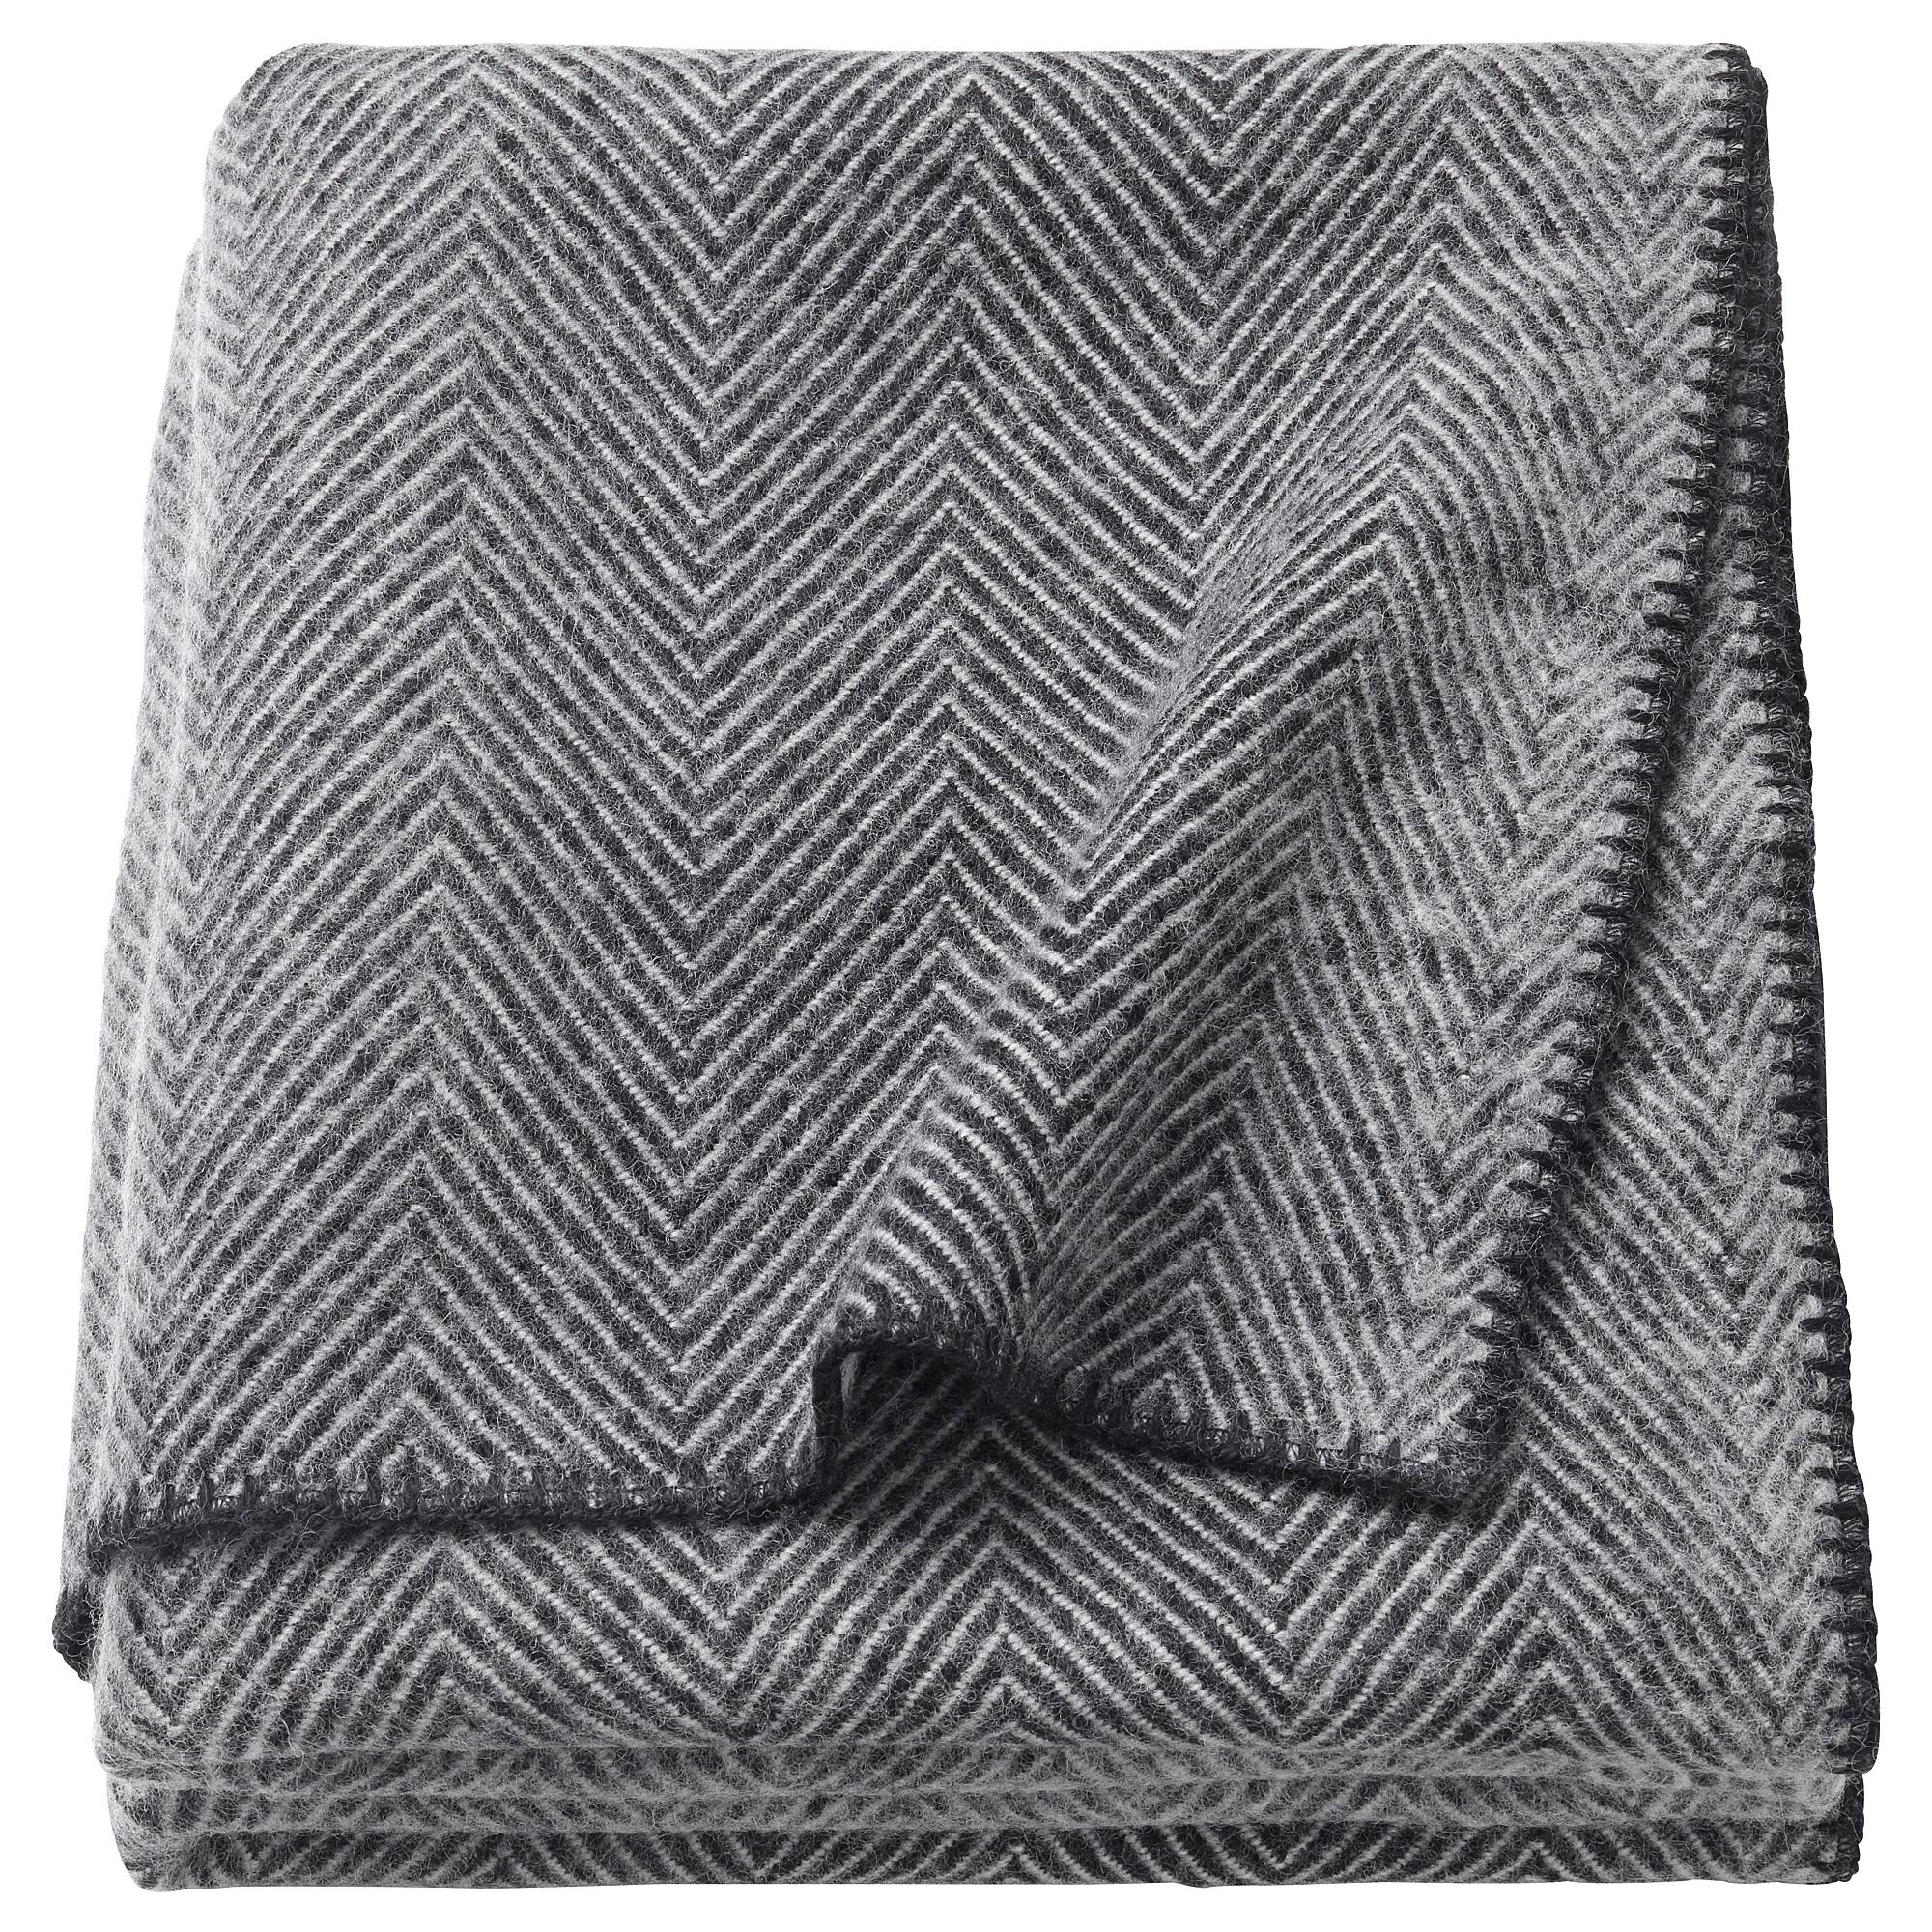 Strimlönn throw - Gray Harringbone, 59 x 79